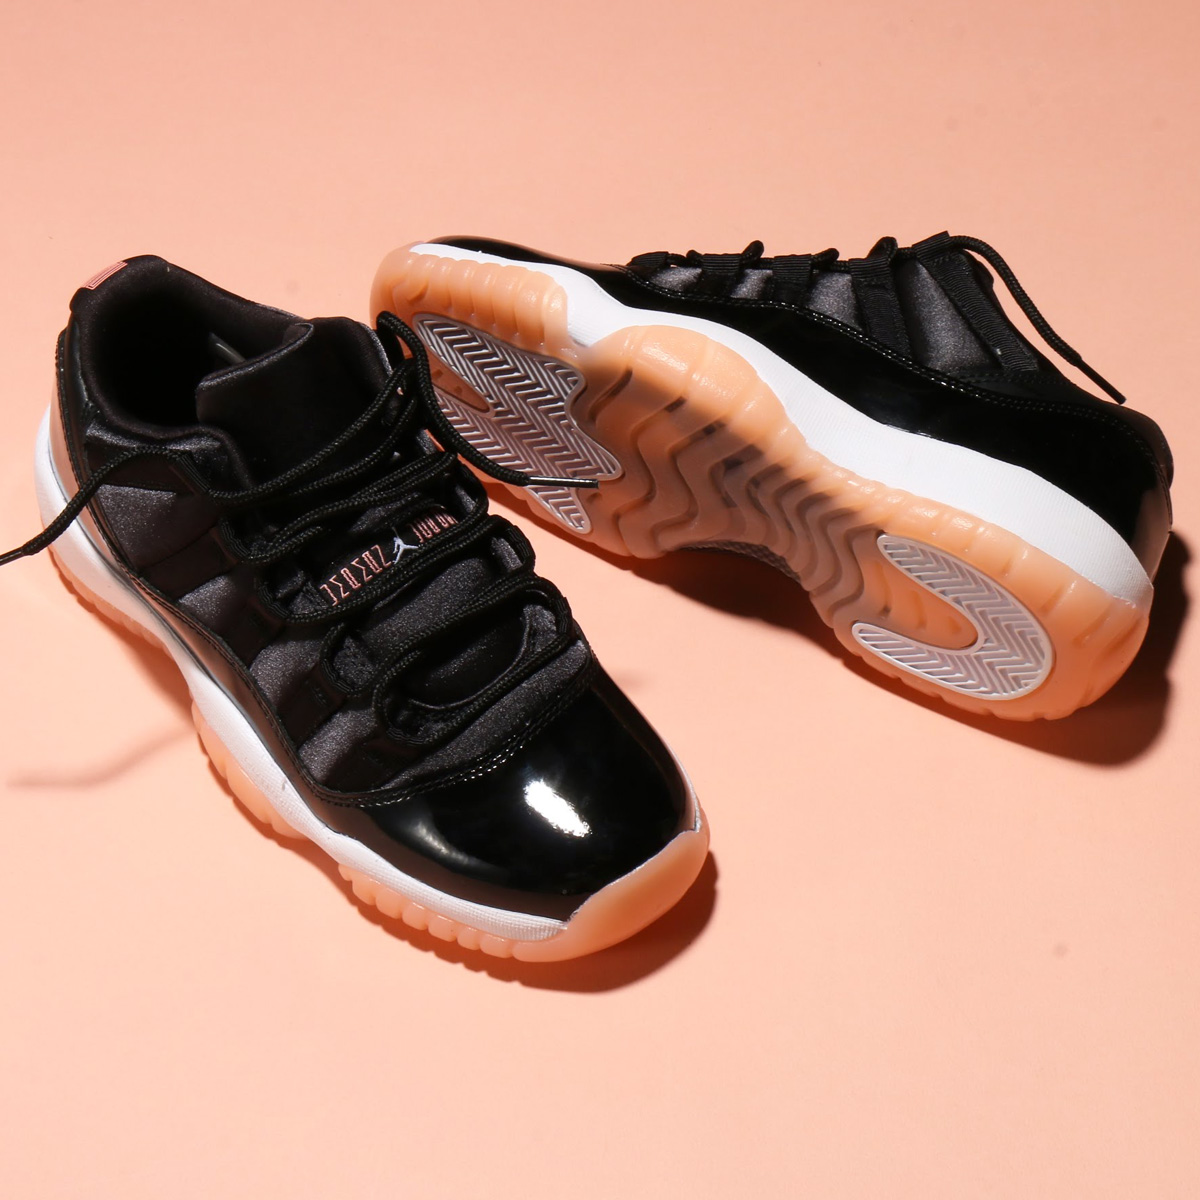 8129d3515242 NIKE AIR JORDAN 11 RETRO LOW GG (Nike Air Jordan 11 nostalgic low GG) (BLACK BLEACHED  CORAL-WHITE) 18SU-S